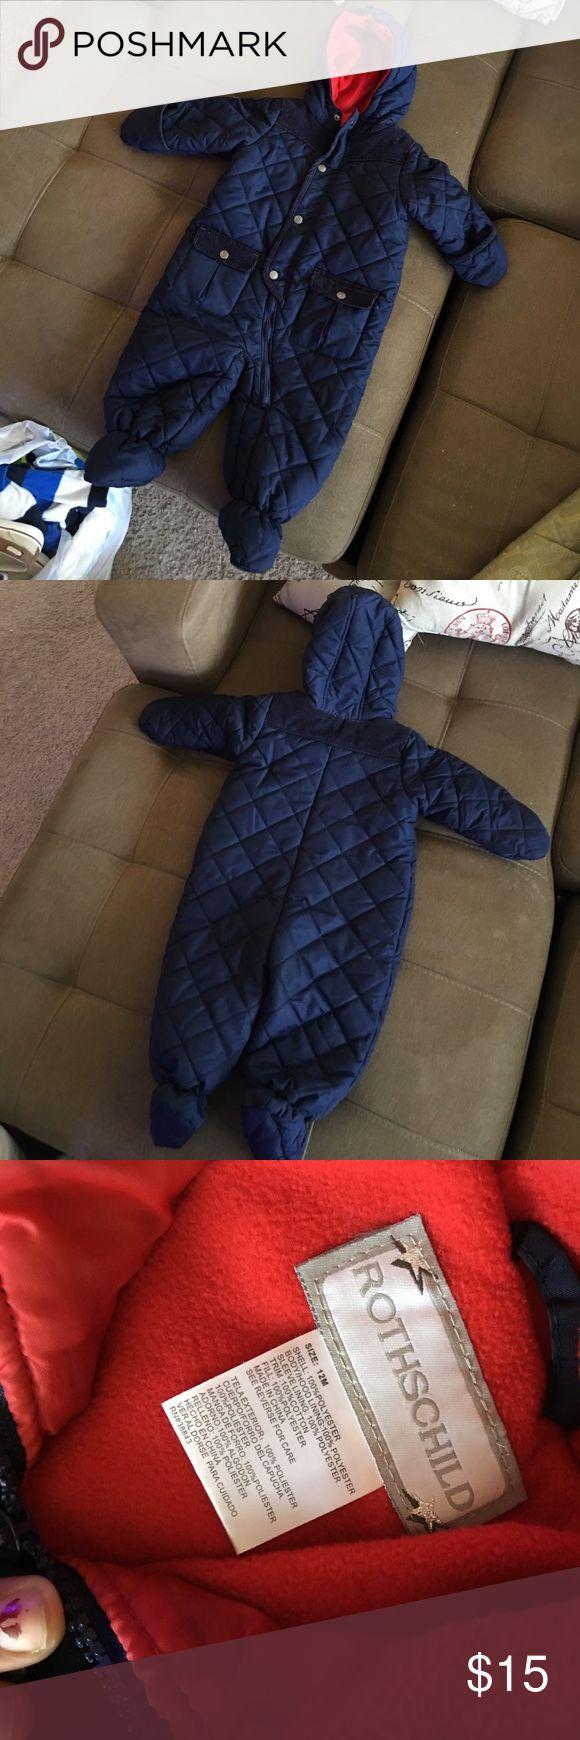 Rothschild baby snowsuit pram Size 12m rothschild Jackets & Coats Puffers